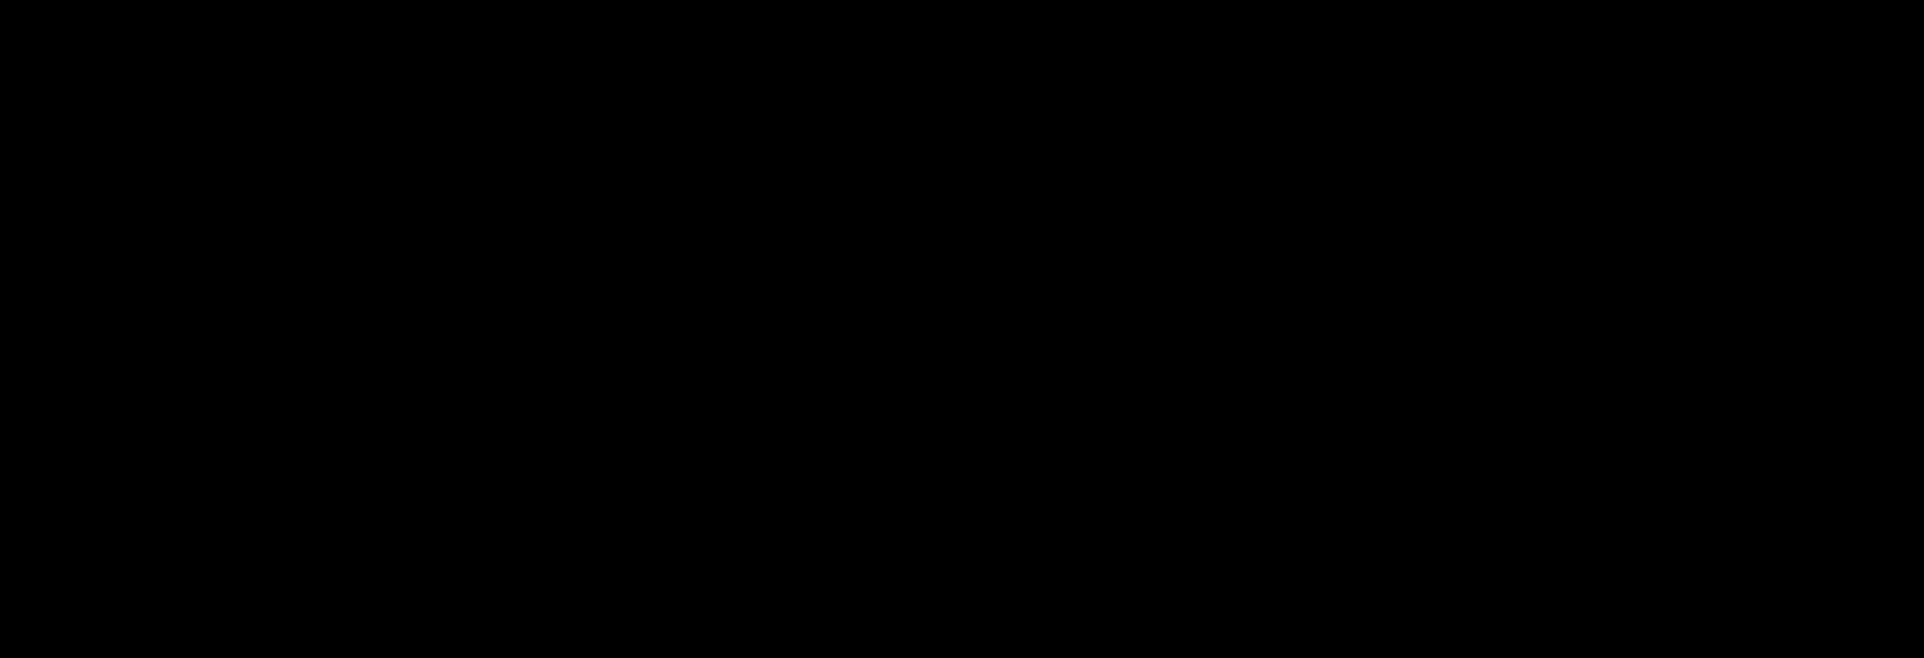 (±)-Metoprolol hydrochloride